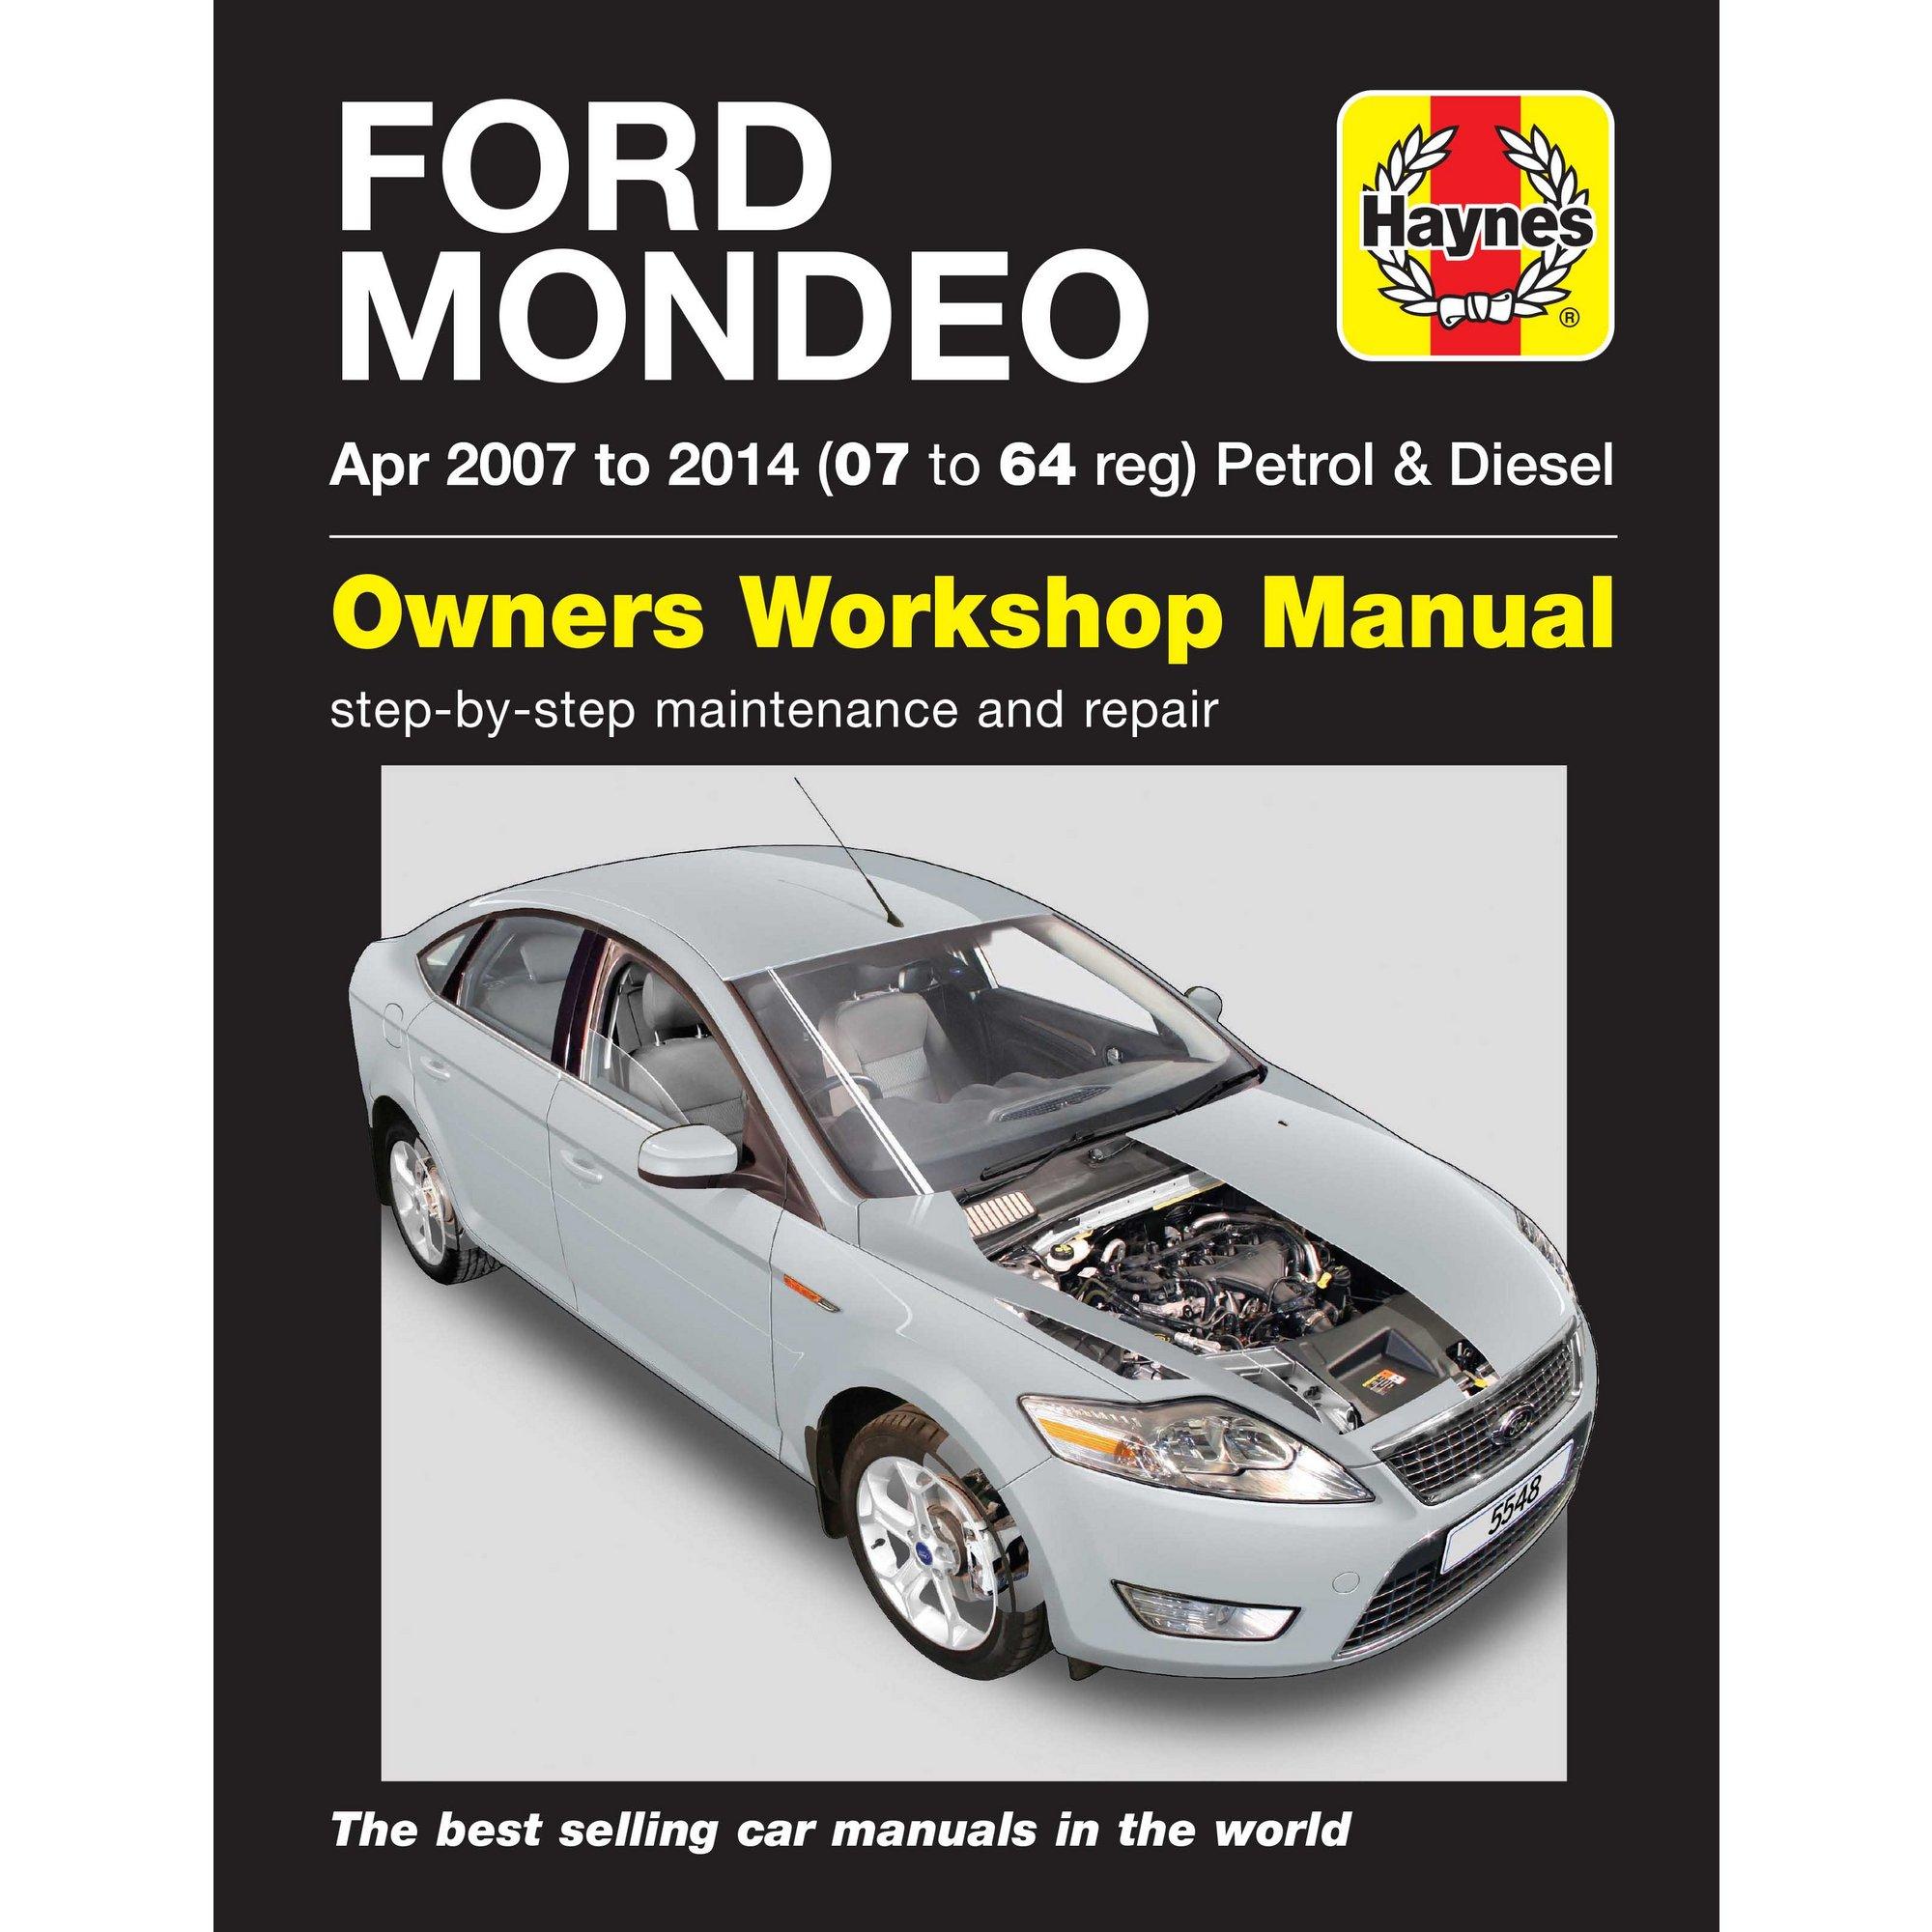 ... Haynes Ford Mondeo Petrol and Diesel Manual ( €24.99 (1) Reserve